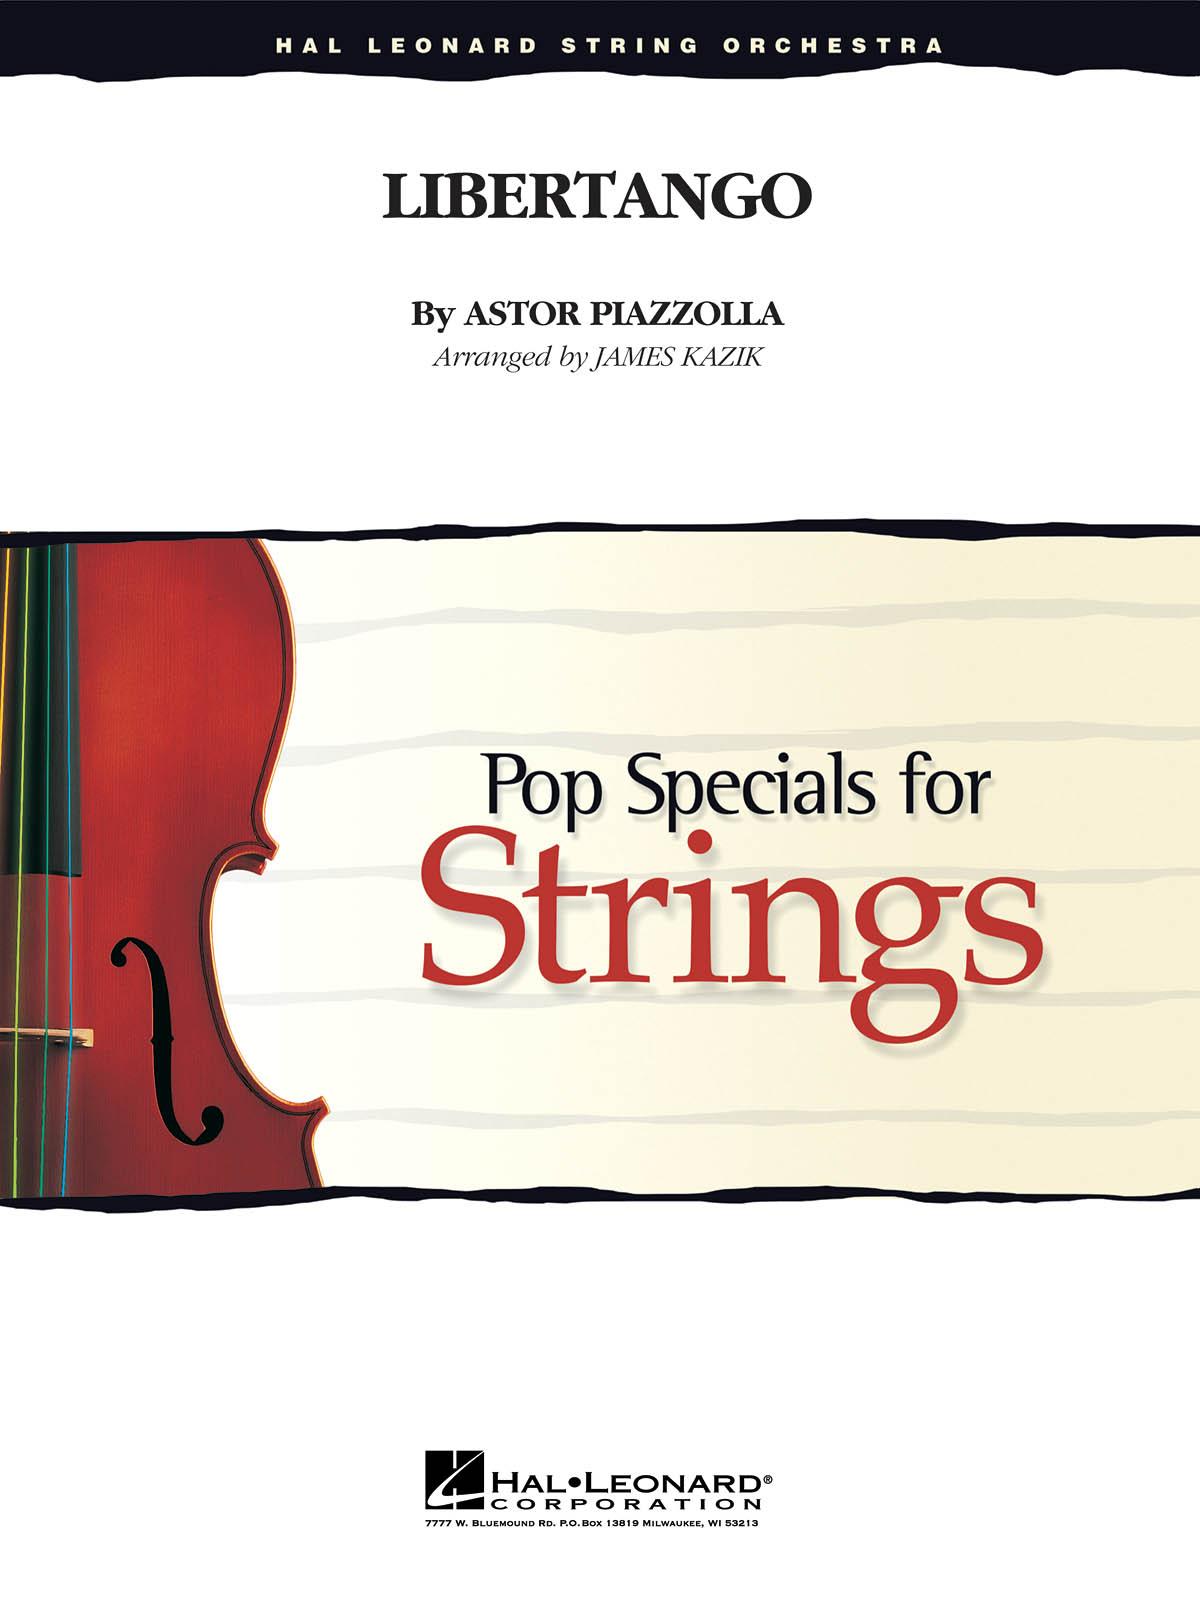 Astor Piazzolla: Libertango: String Ensemble: Score & Parts